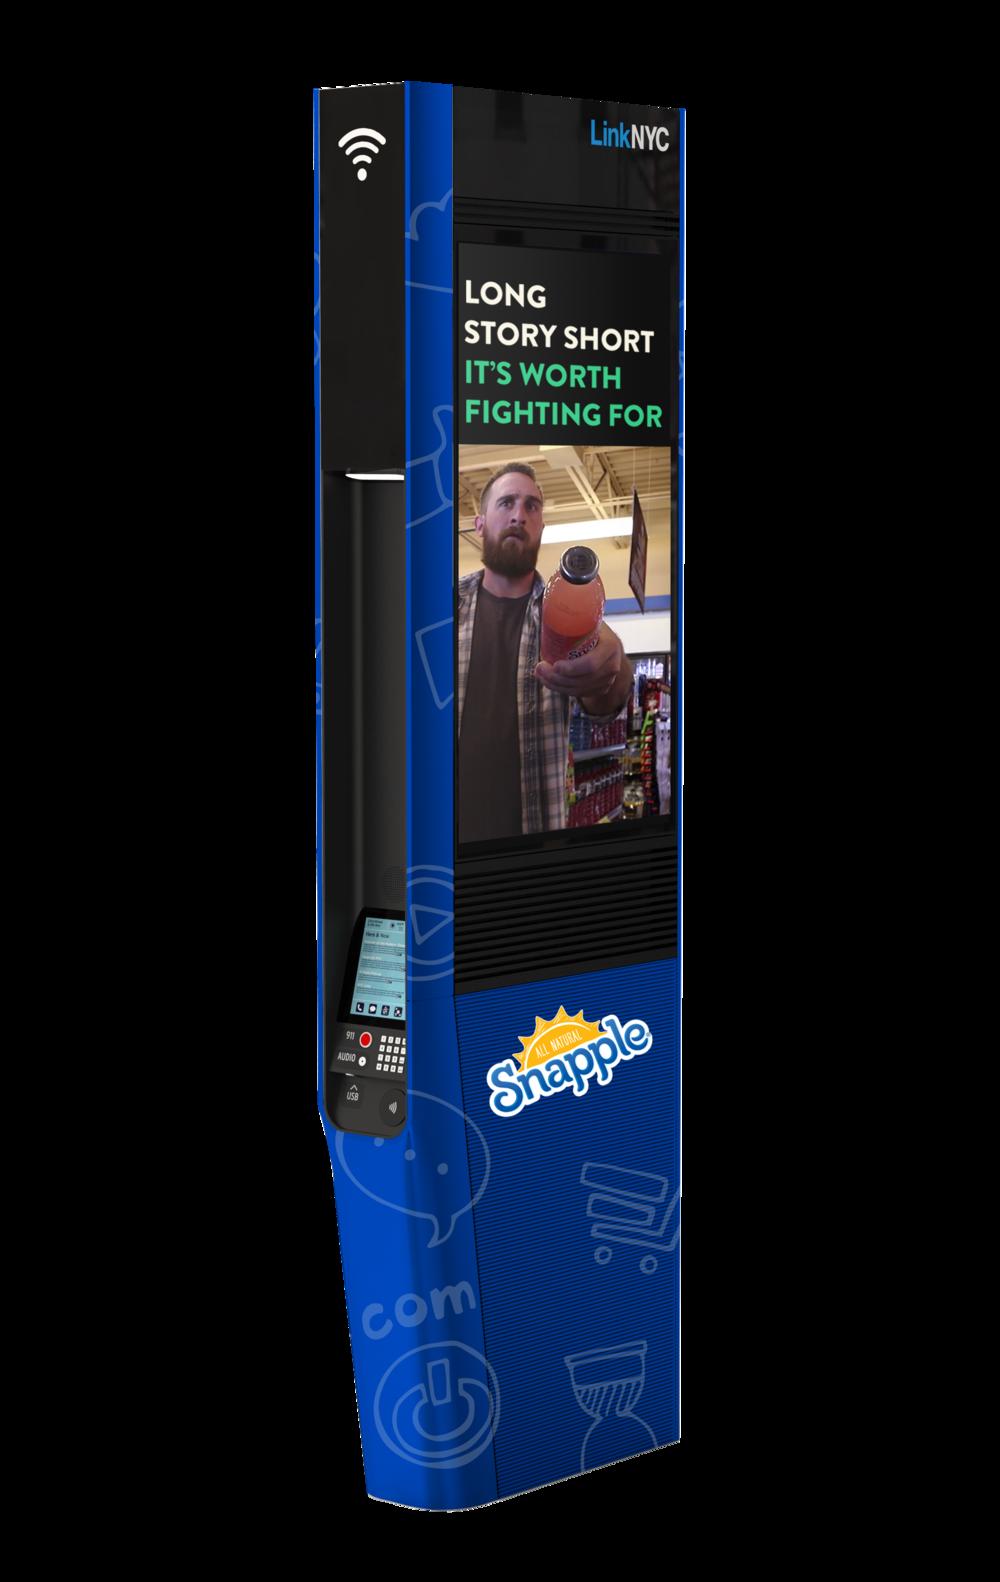 Wi-Fi Kiosk / Twitter Vending Machine